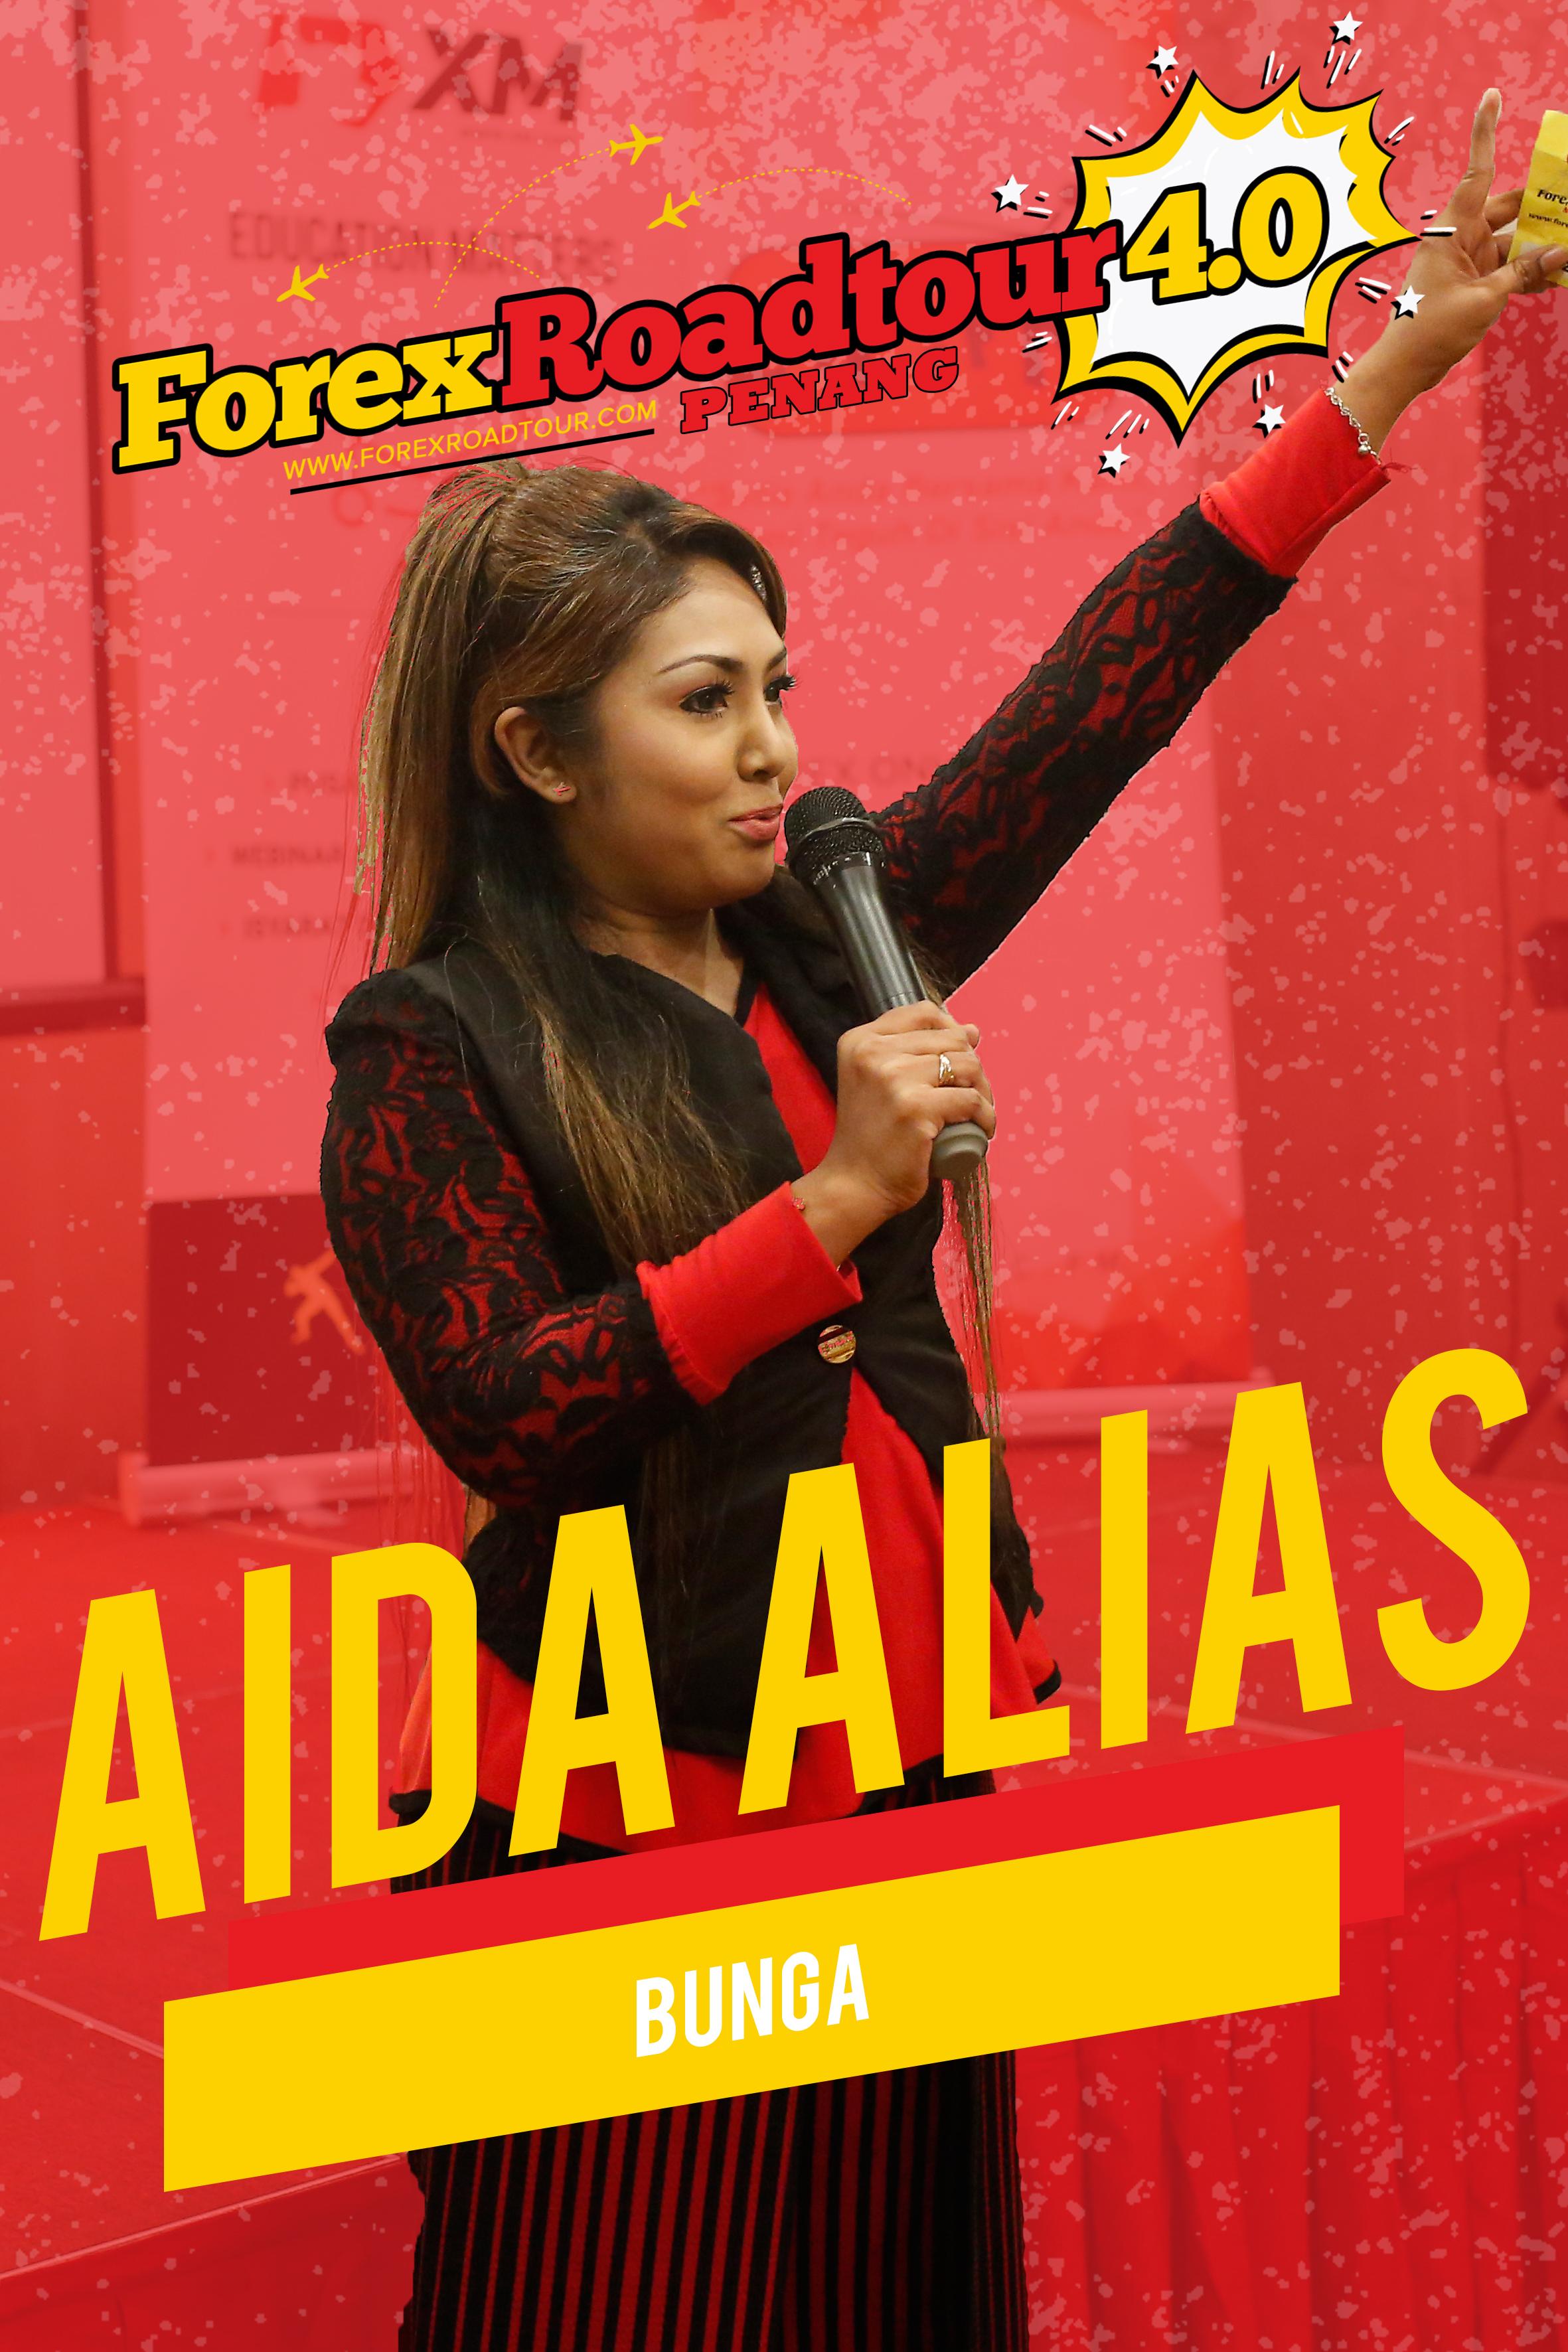 Aida Alias - Bunga [Forex Roadtour 4.0 Penang]